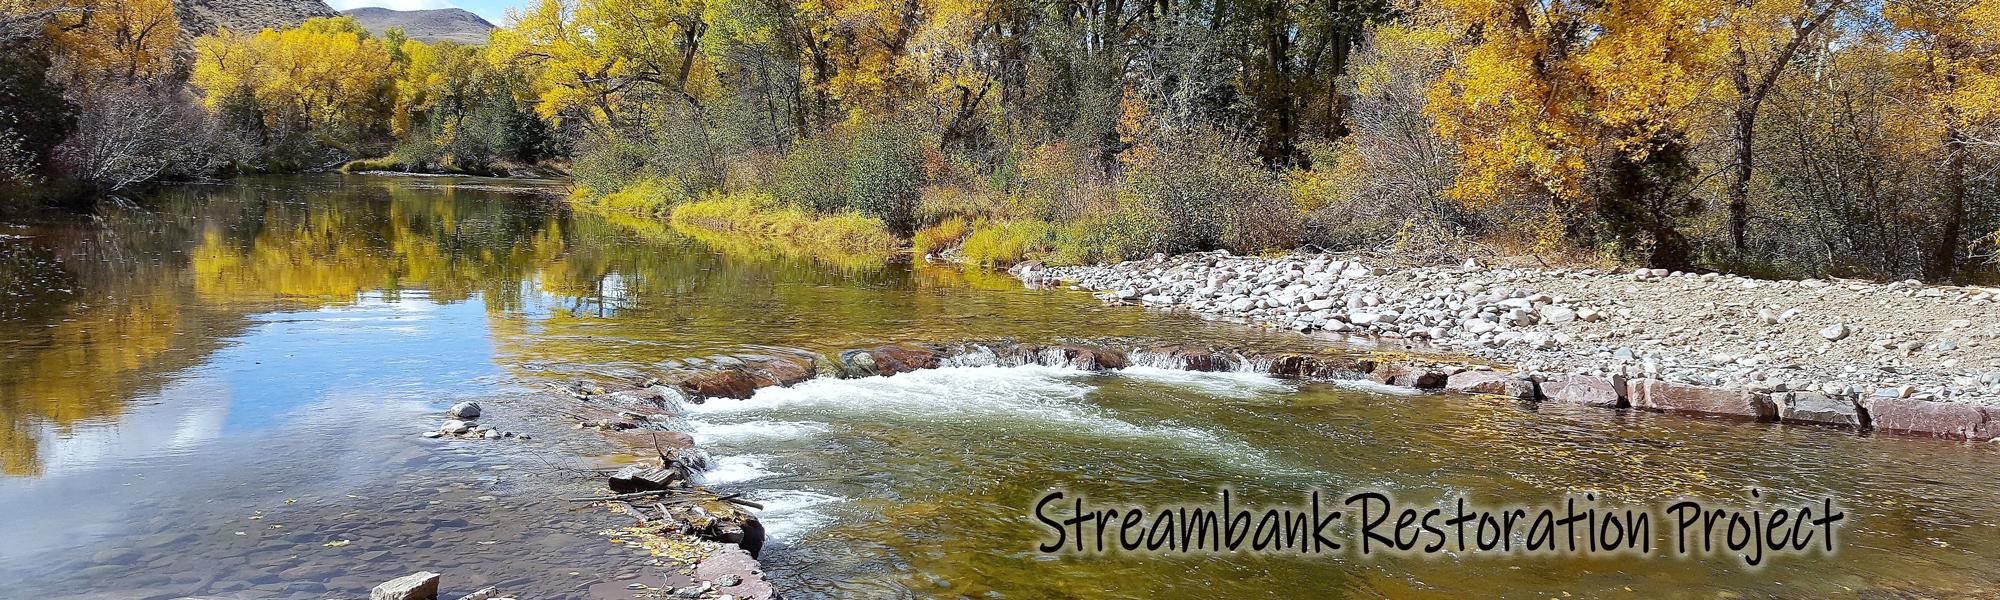 streambank restoration project